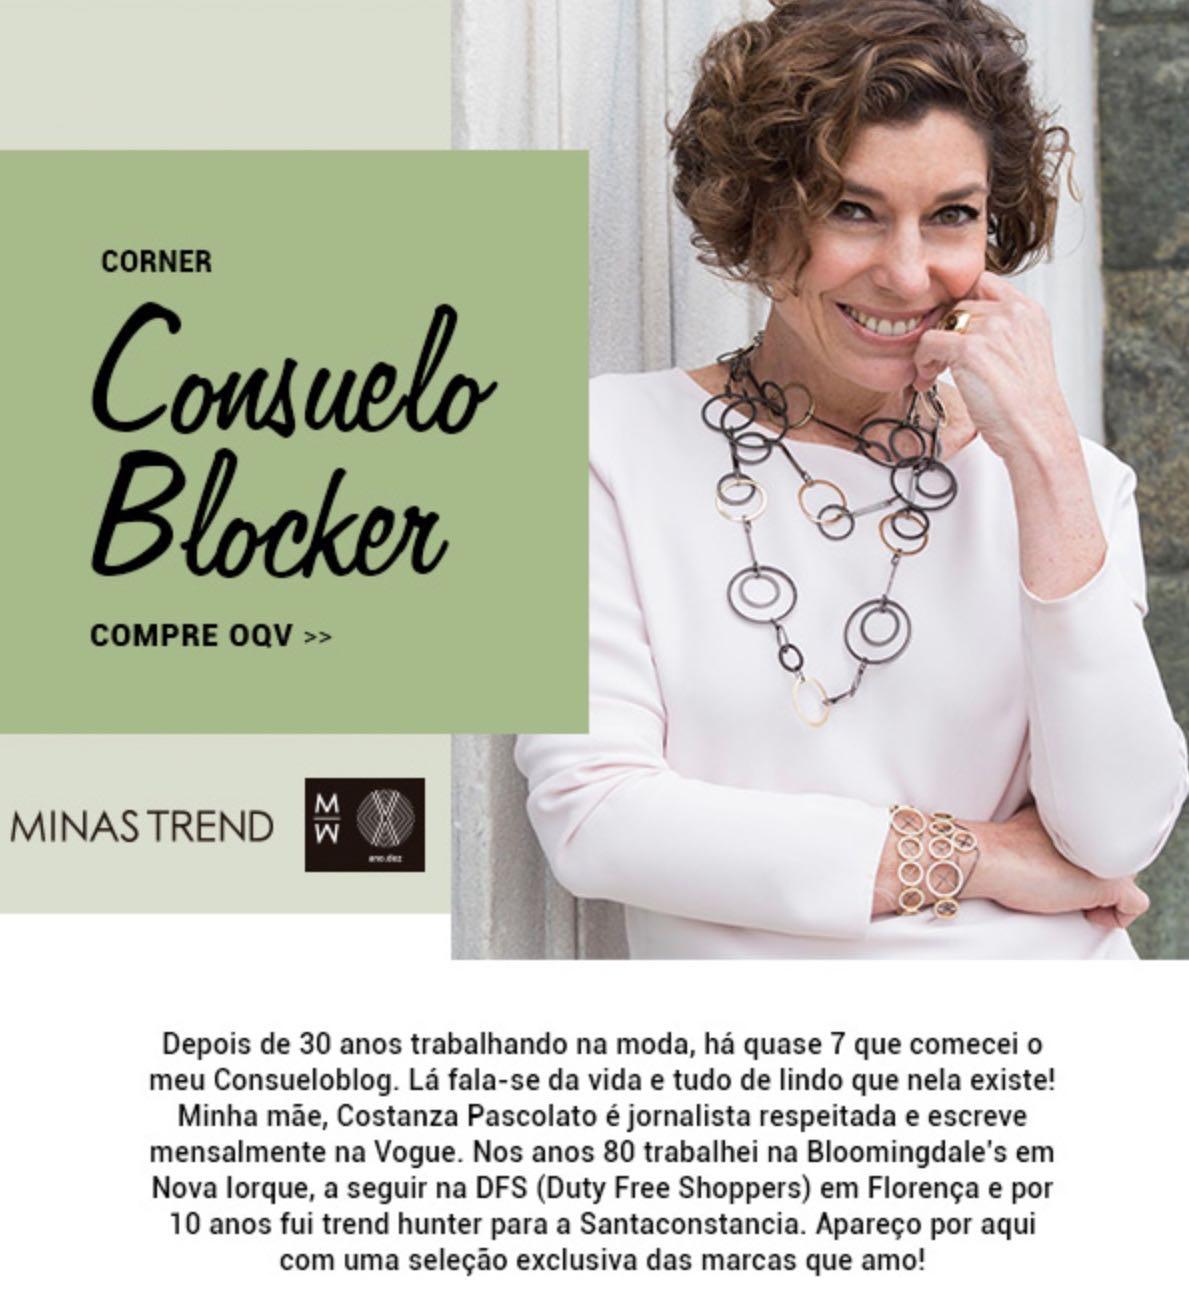 corner consuelo blocker